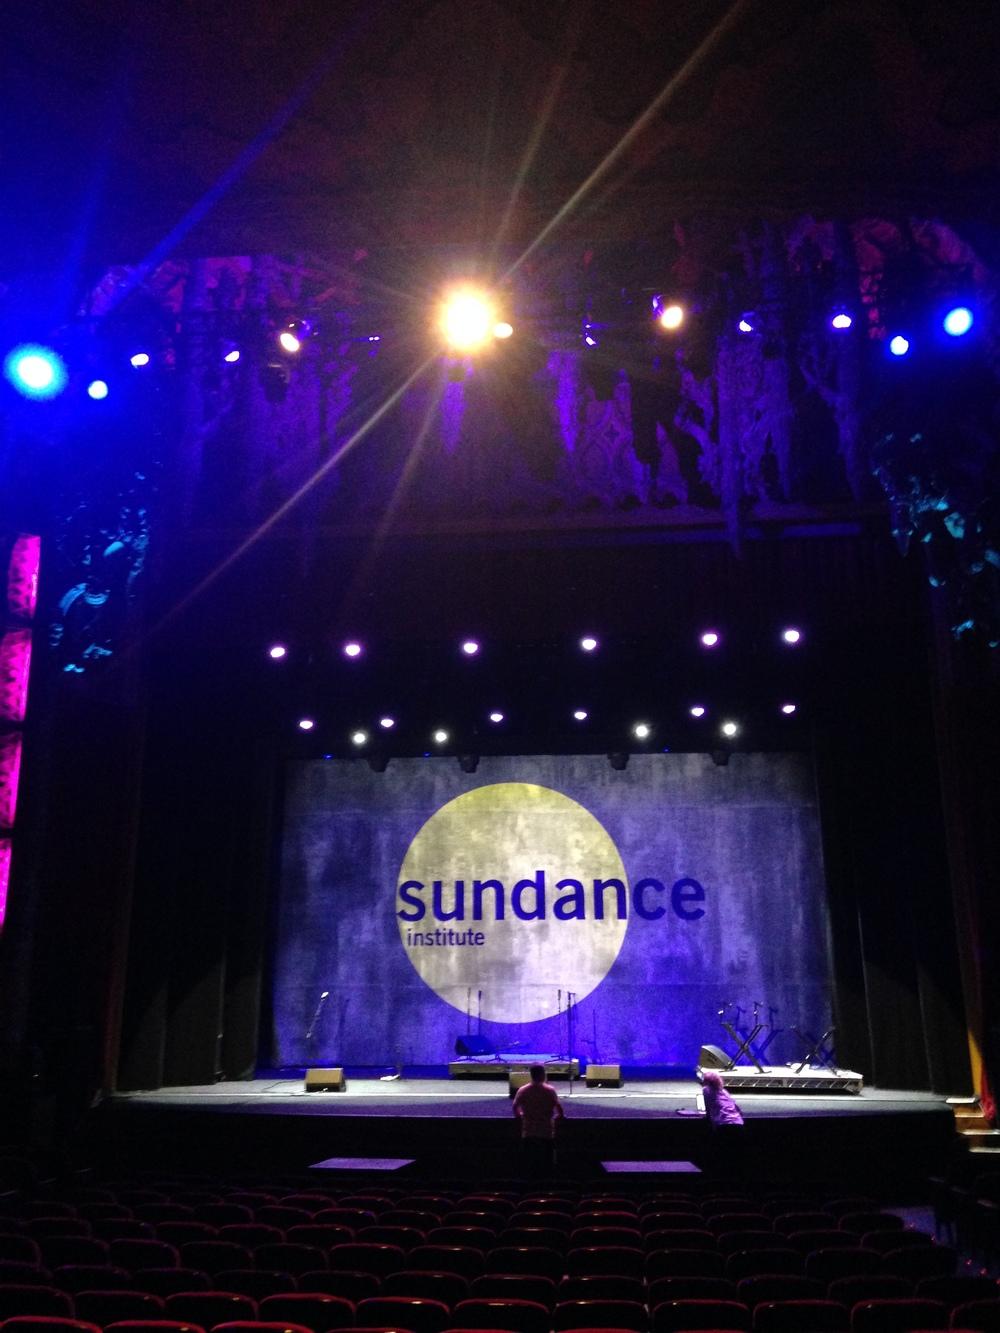 Sundance NextFest